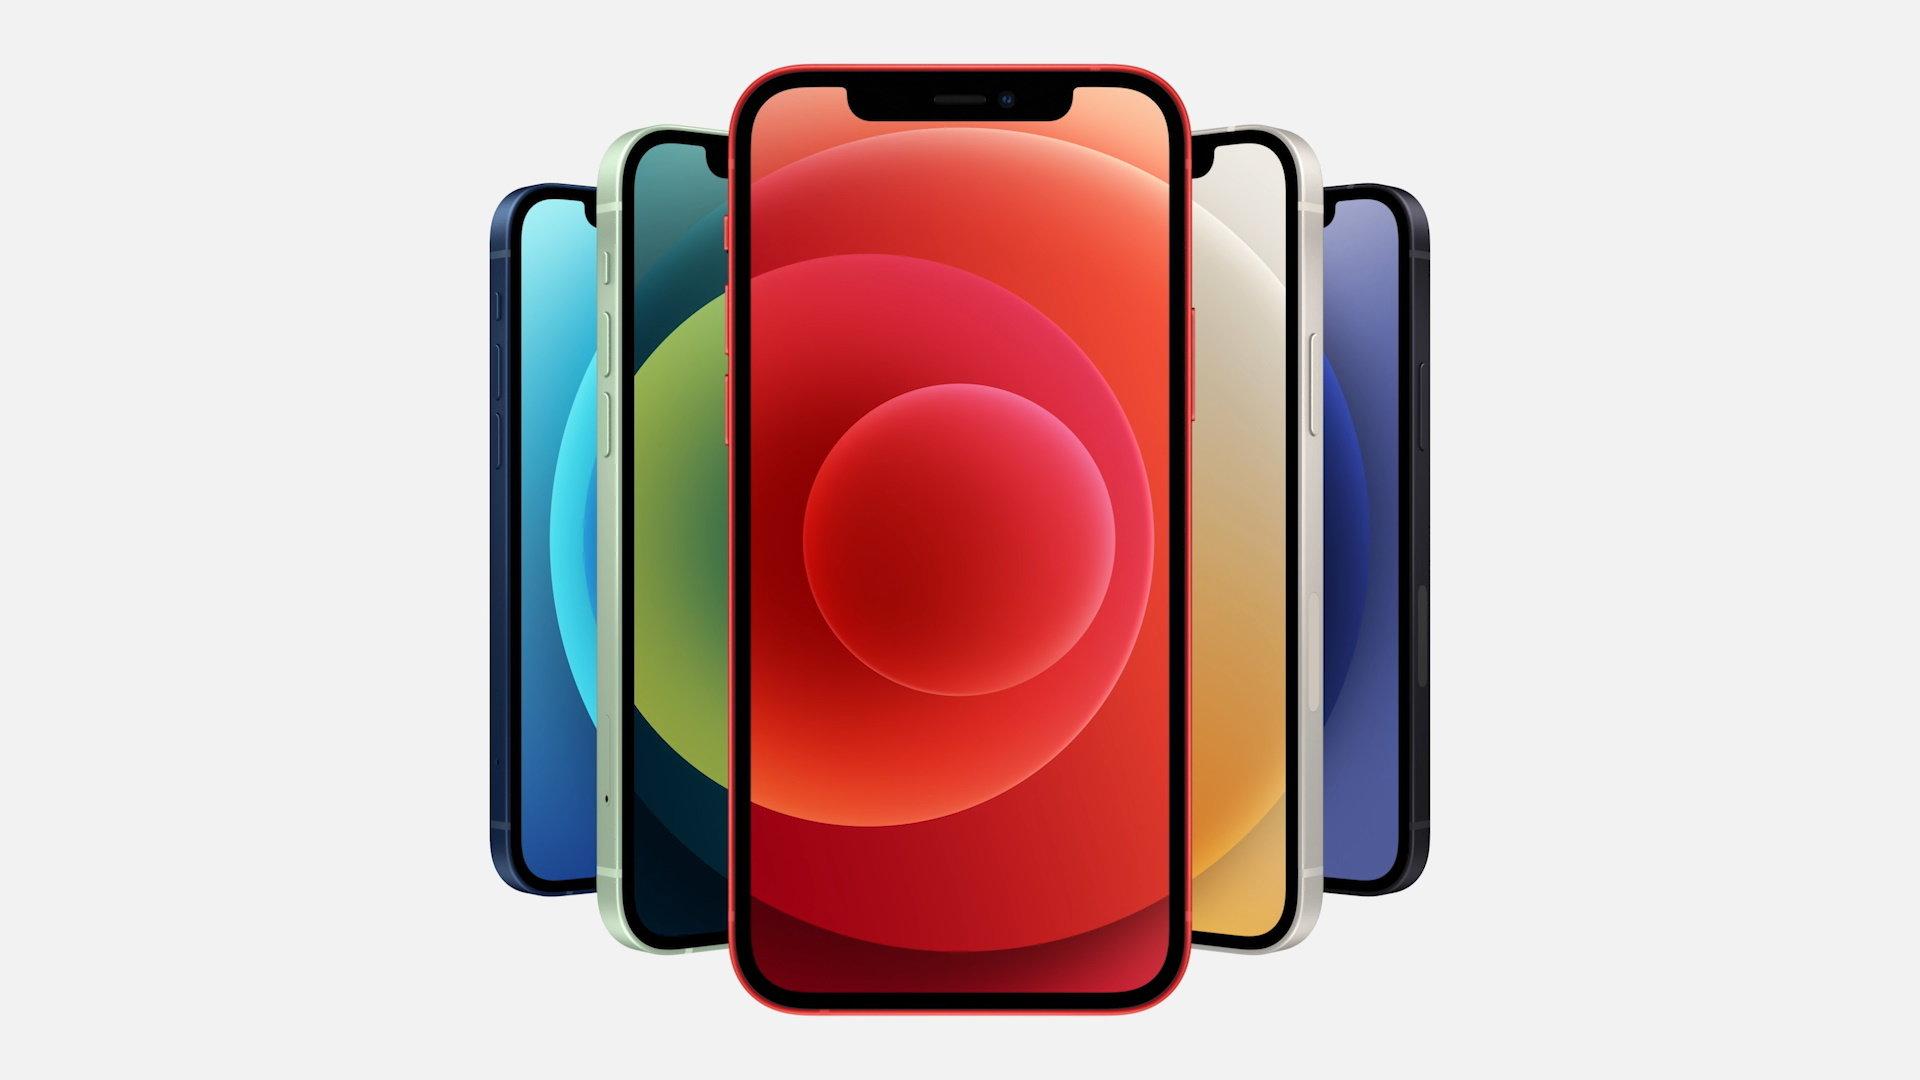 iphone12 | 20201023